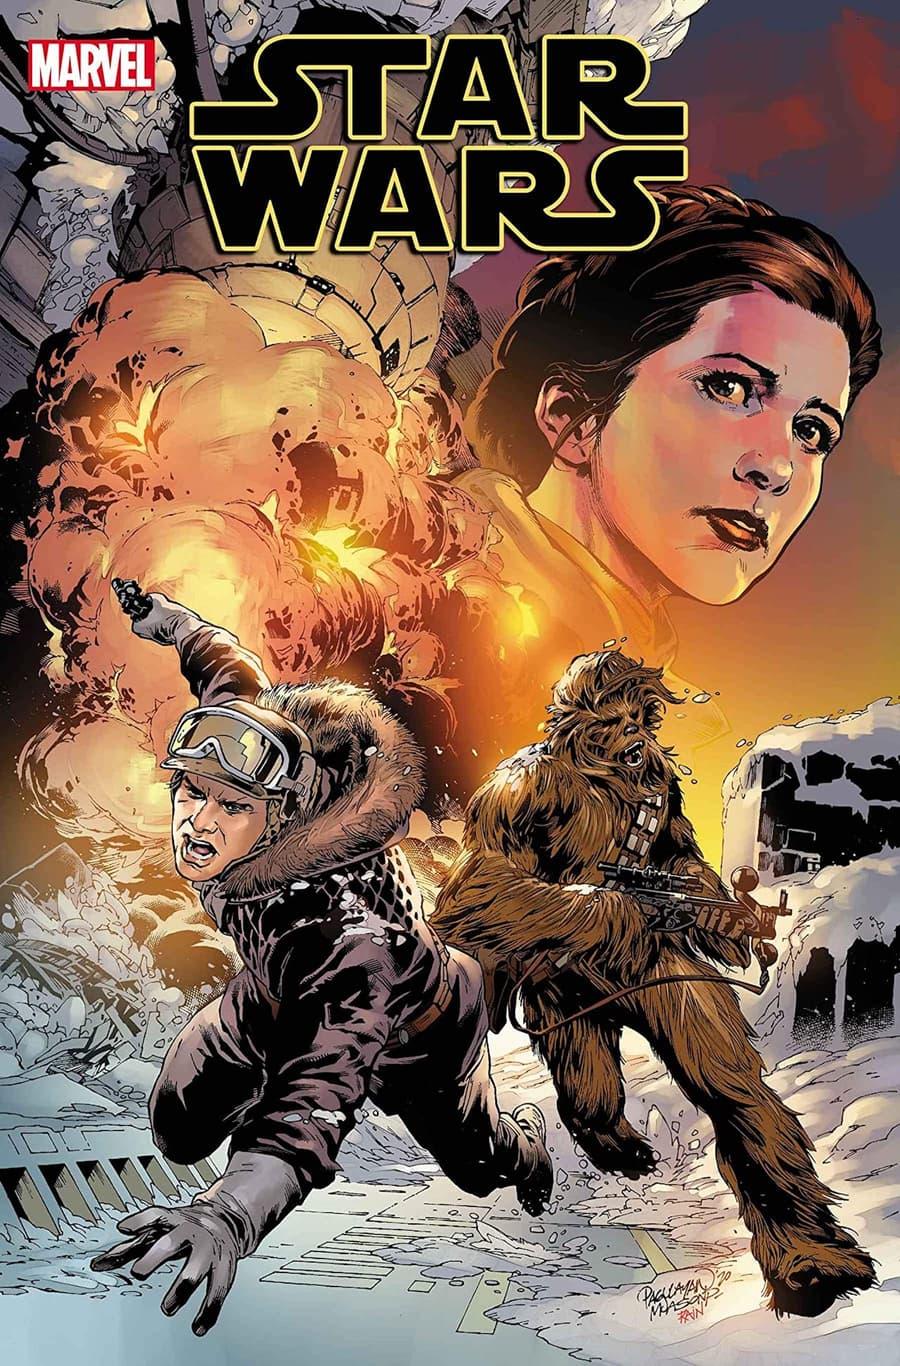 STAR WARS #12 cover by Carlo Pagulayan, Jason Paz, and Rain Beredo